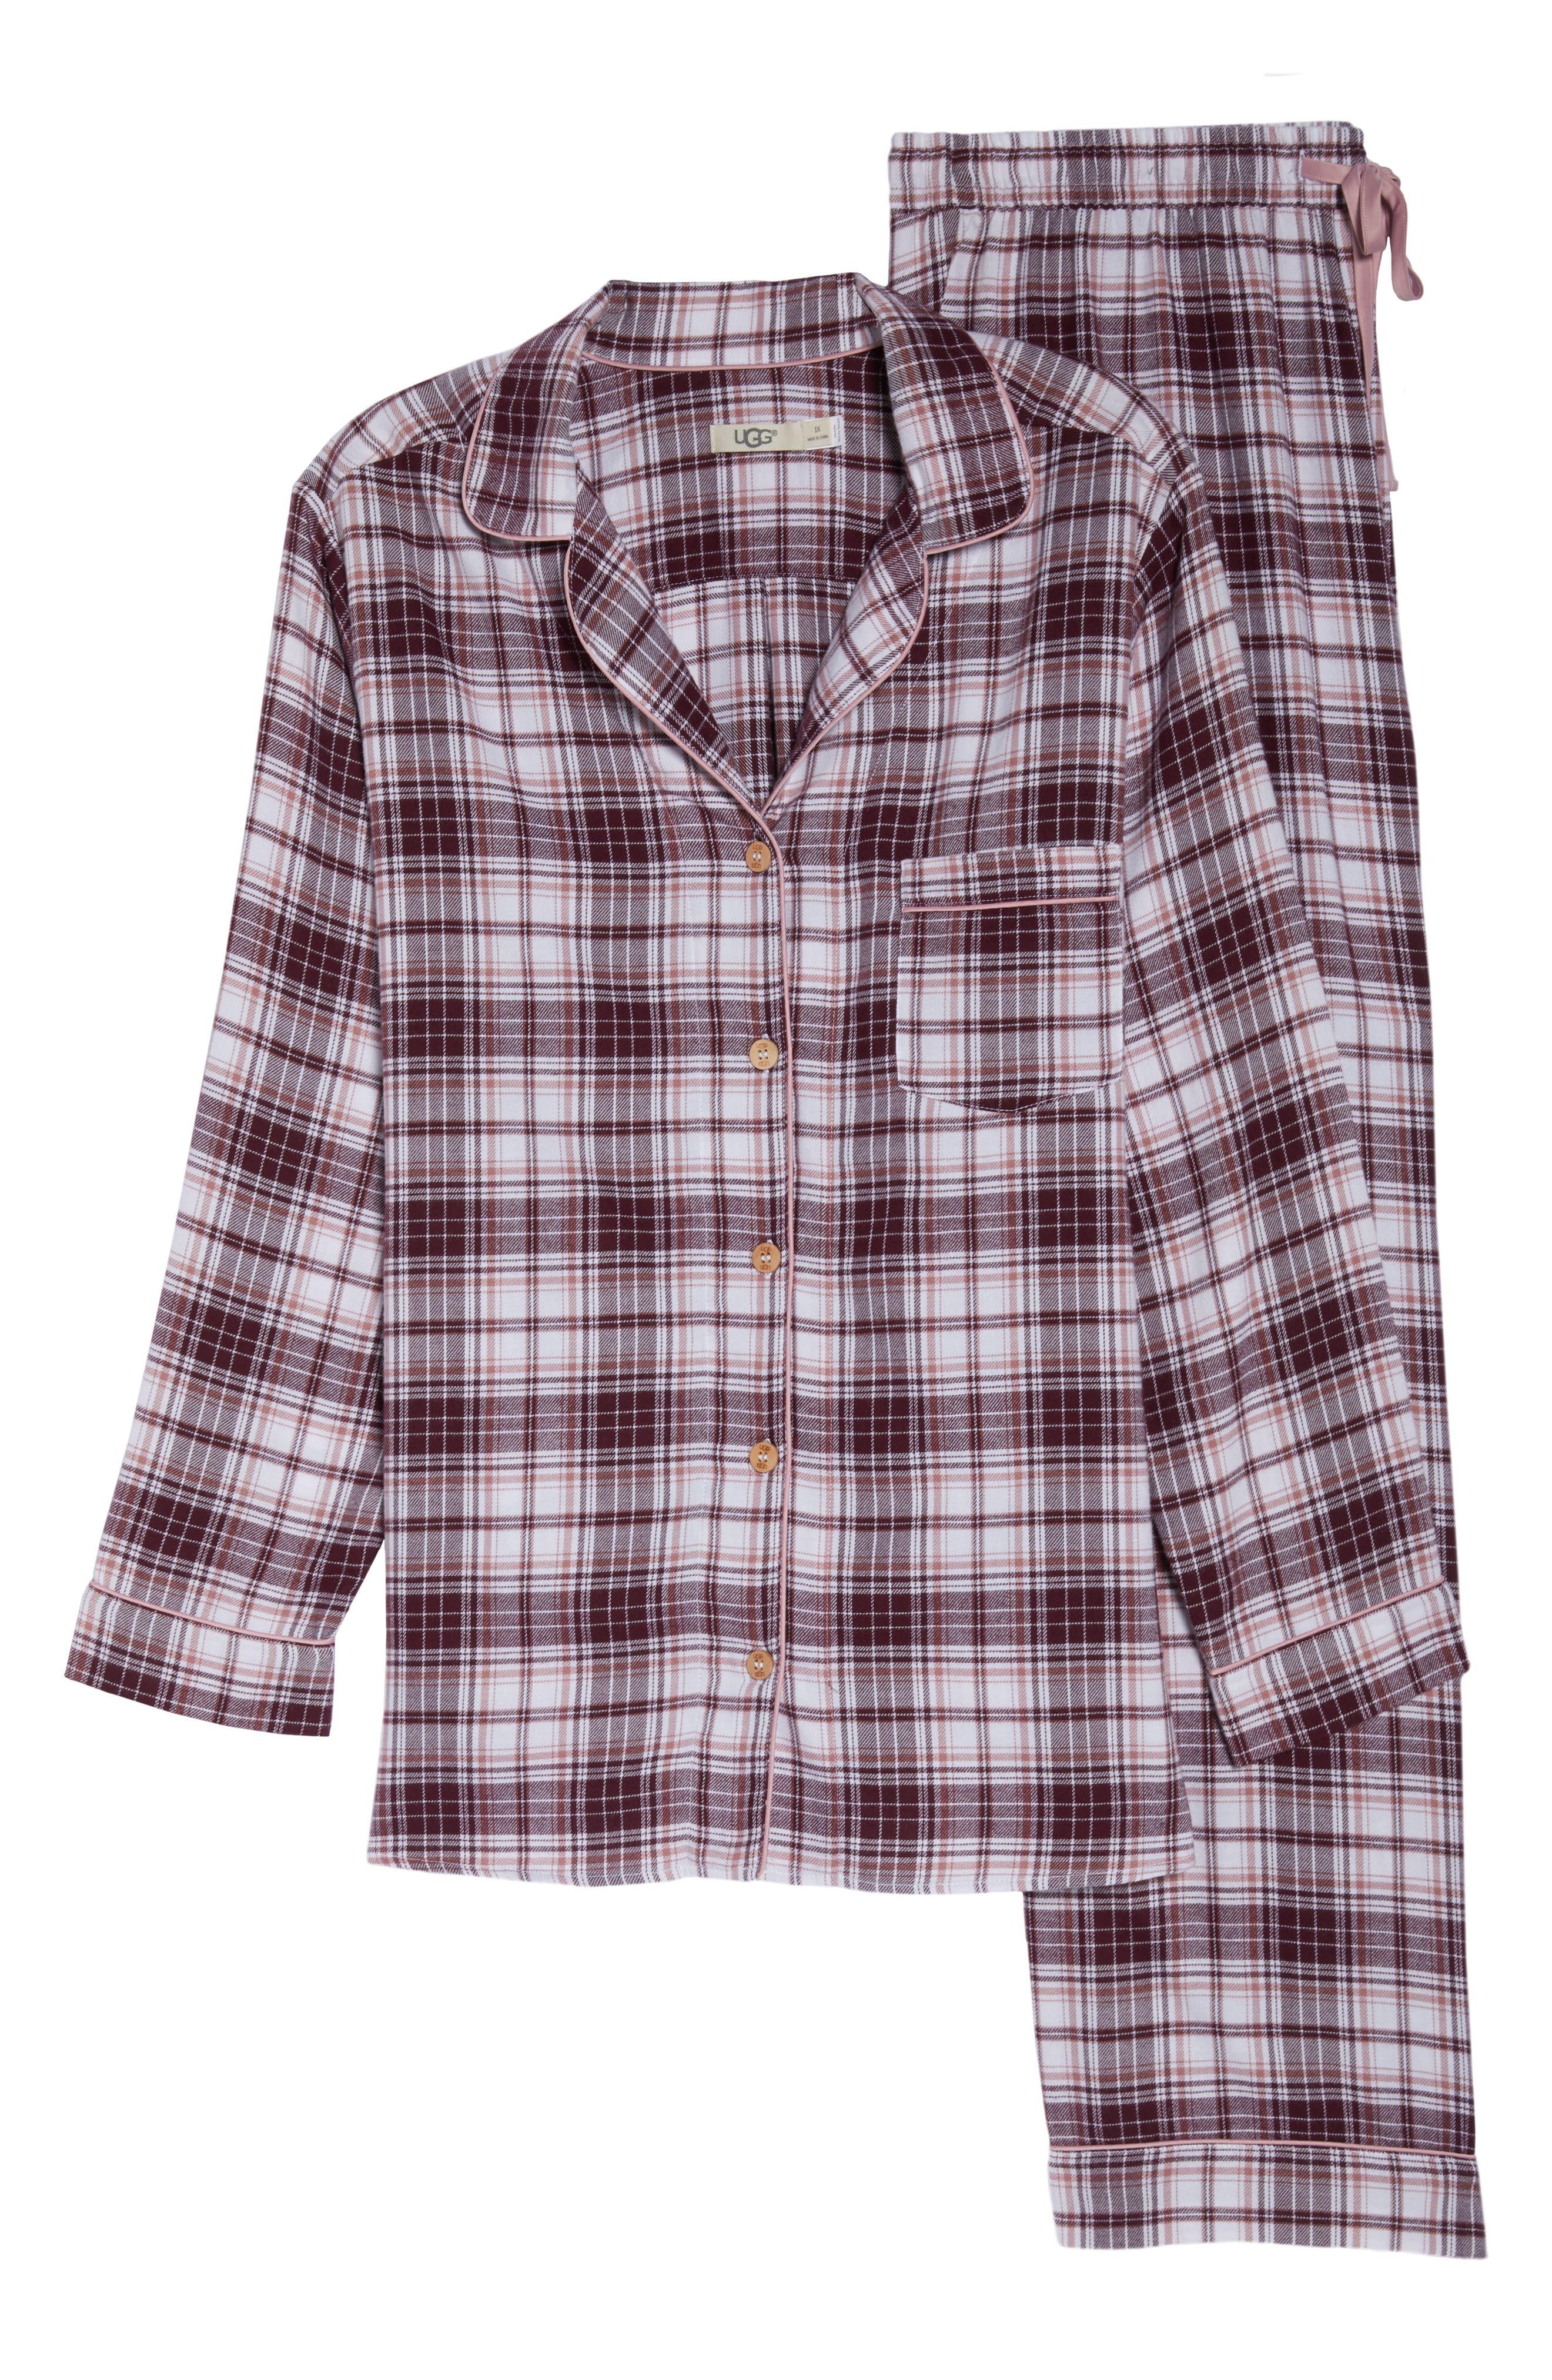 Raven Plaid Pajamas,                             Alternate thumbnail 6, color,                             PORT PLAID